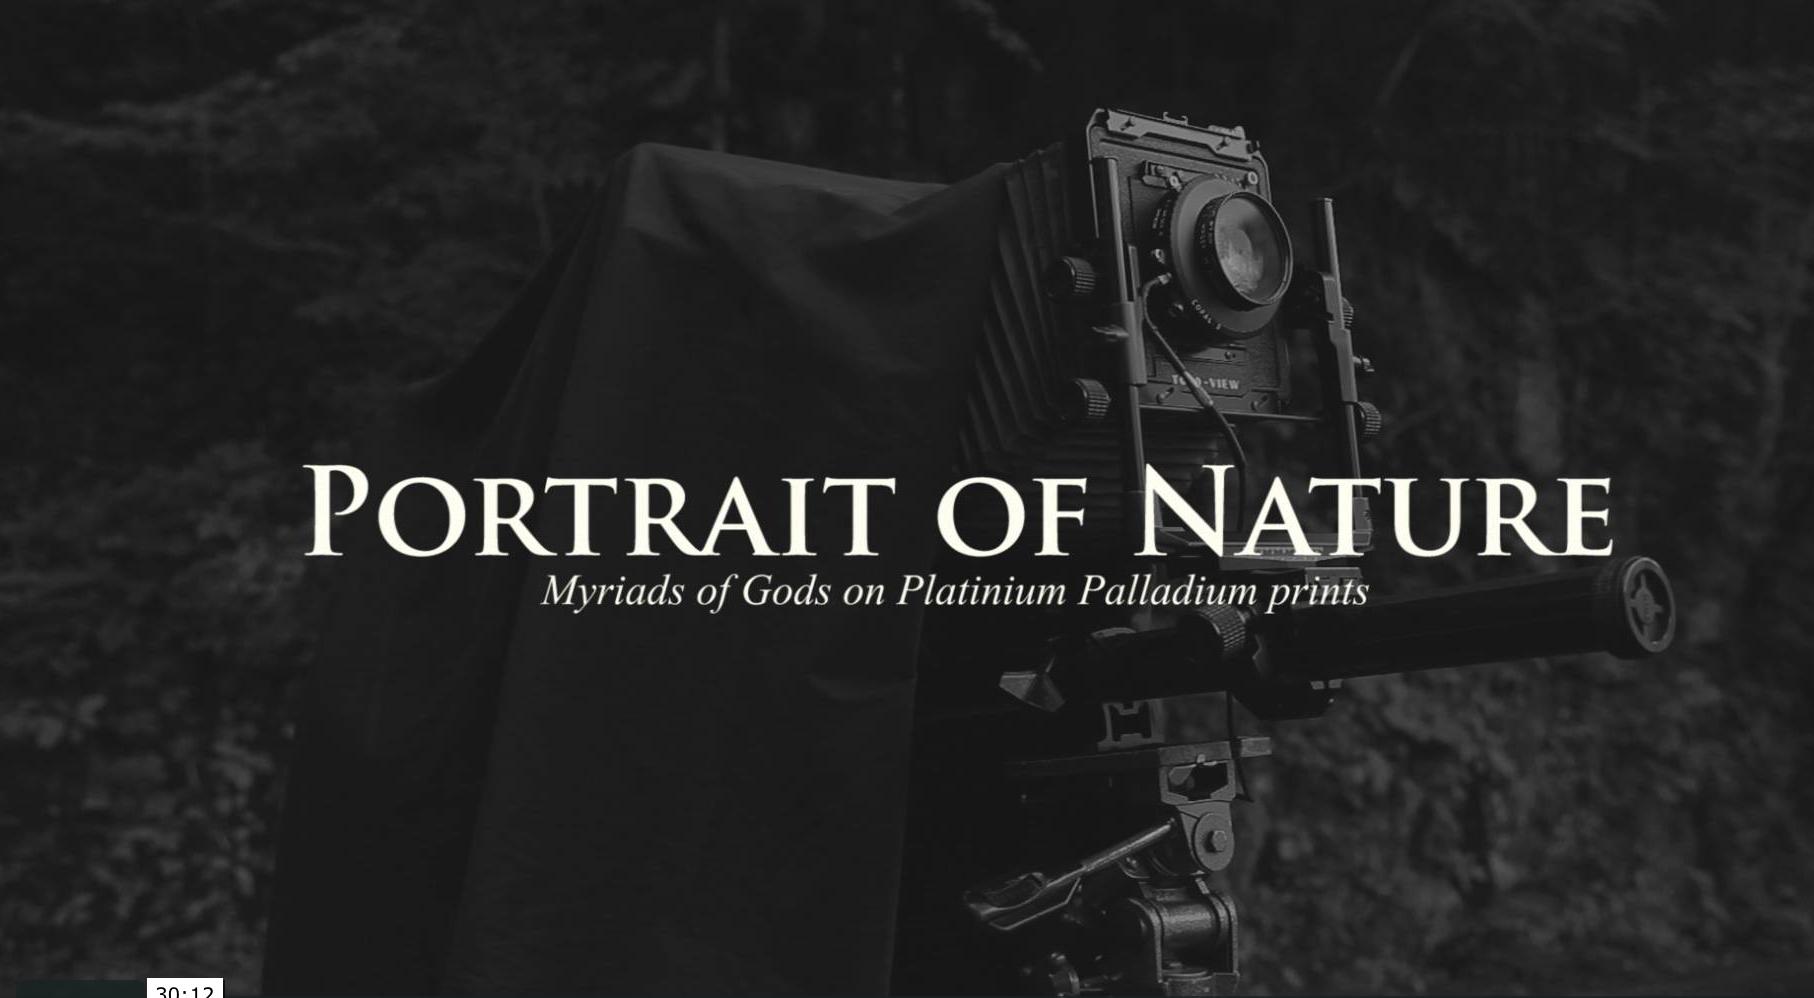 Fotografo artesanal